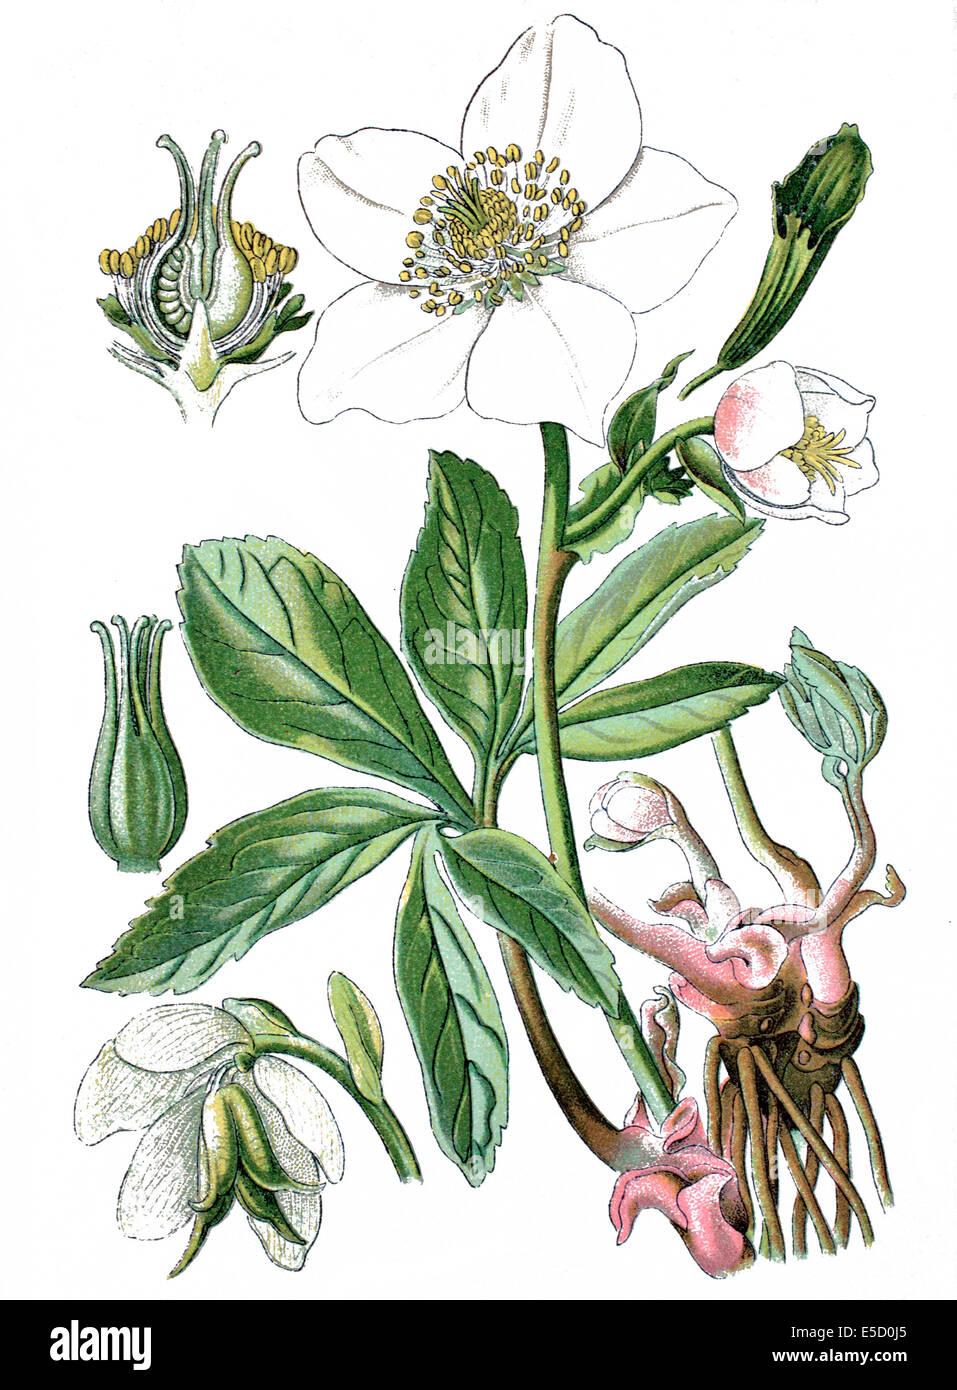 Christmas rose or black hellebore, Helleborus niger Stock Photo